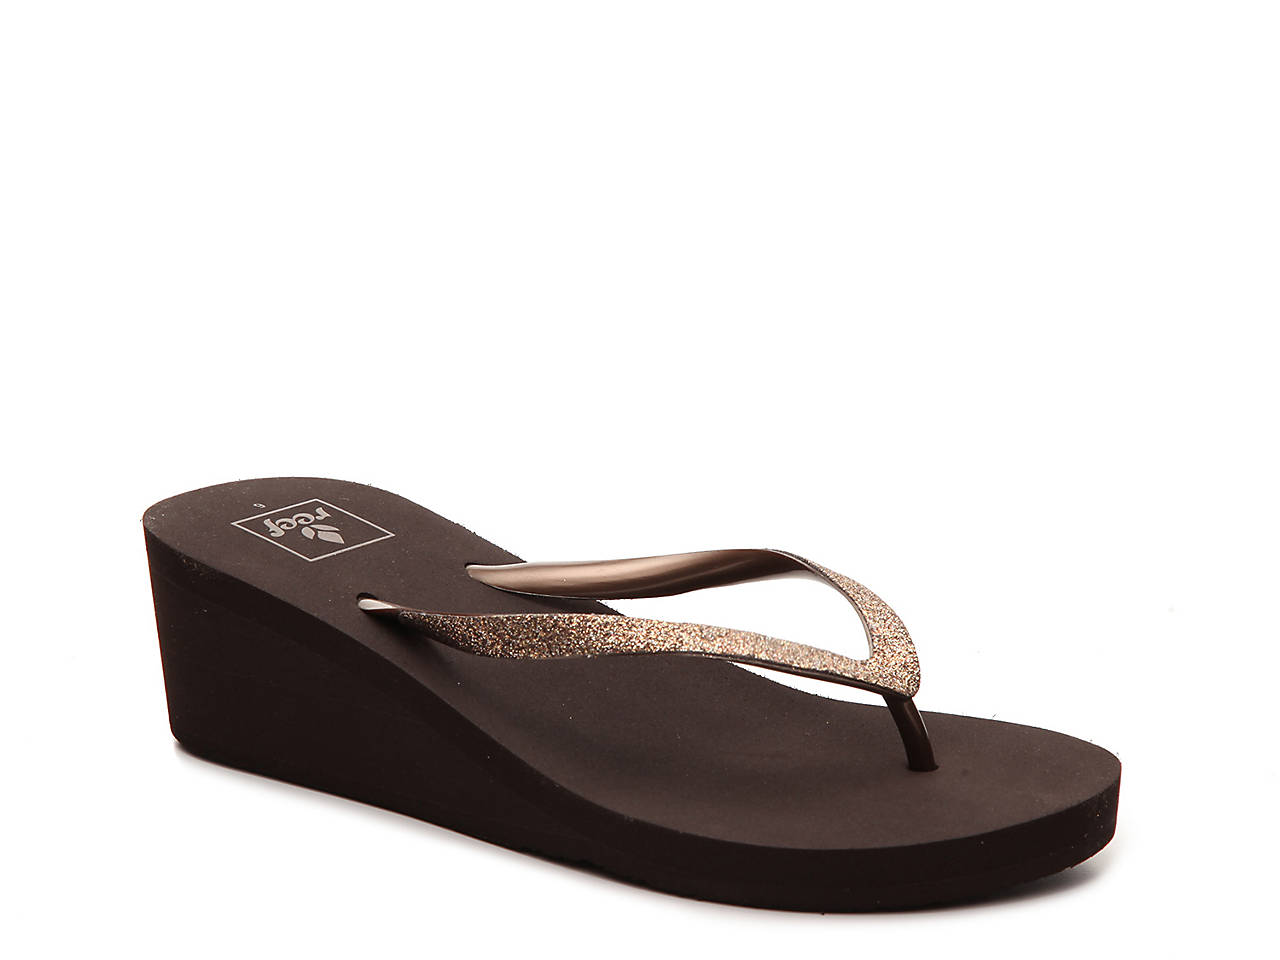 f6a7b1a0dc24cd Reef Krystal Star Wedge Flip Flop Women s Shoes